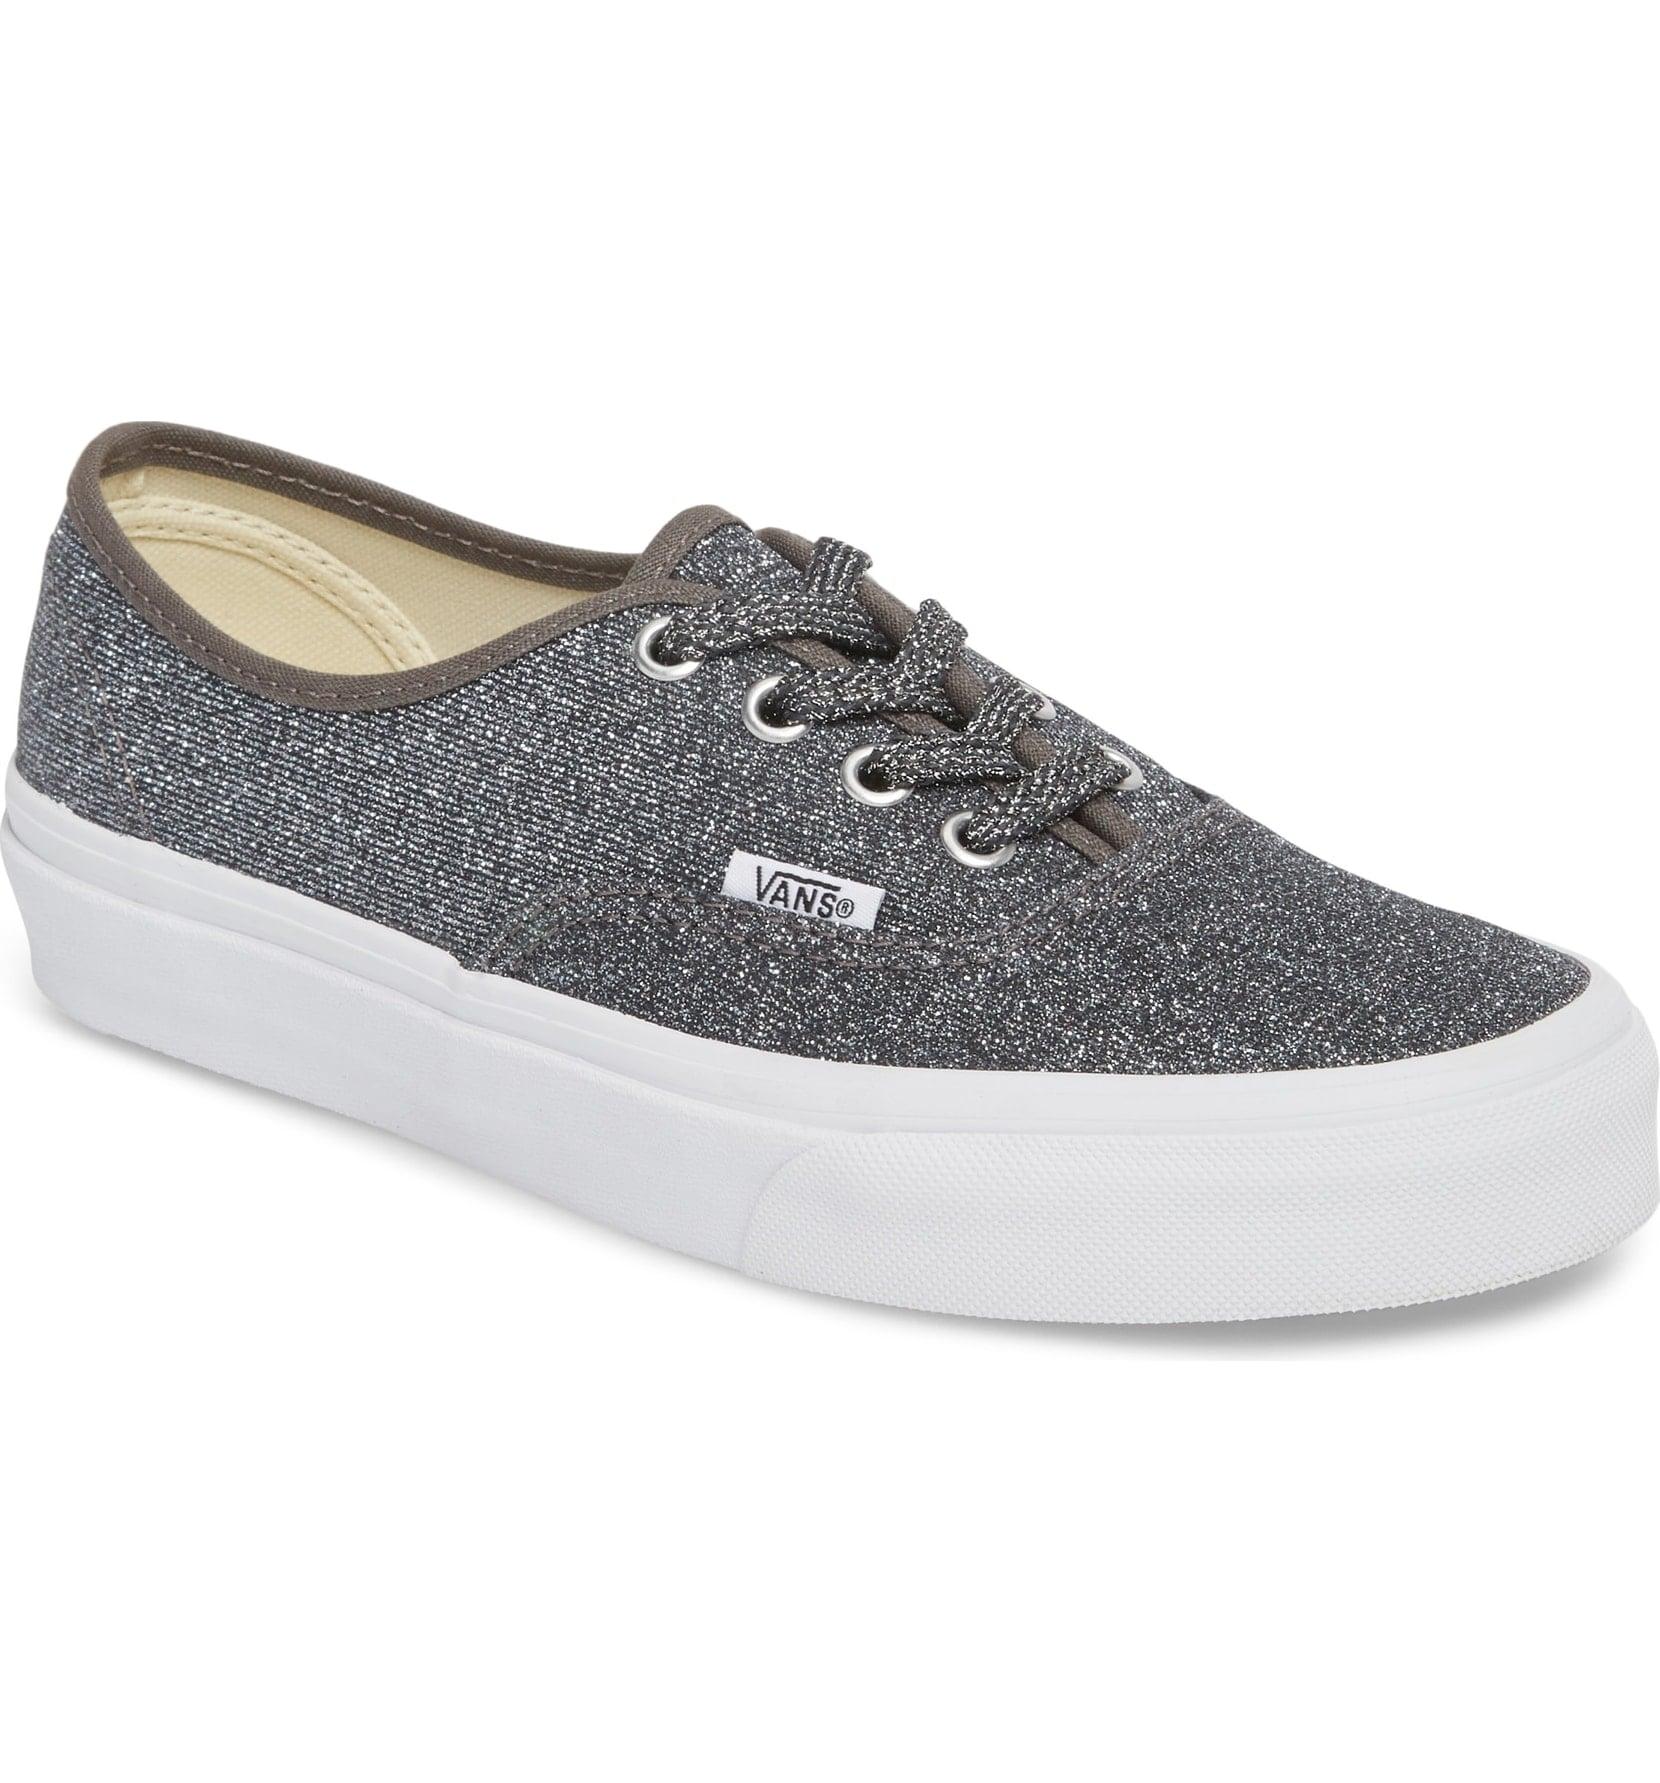 nordstrom glitter sneakers